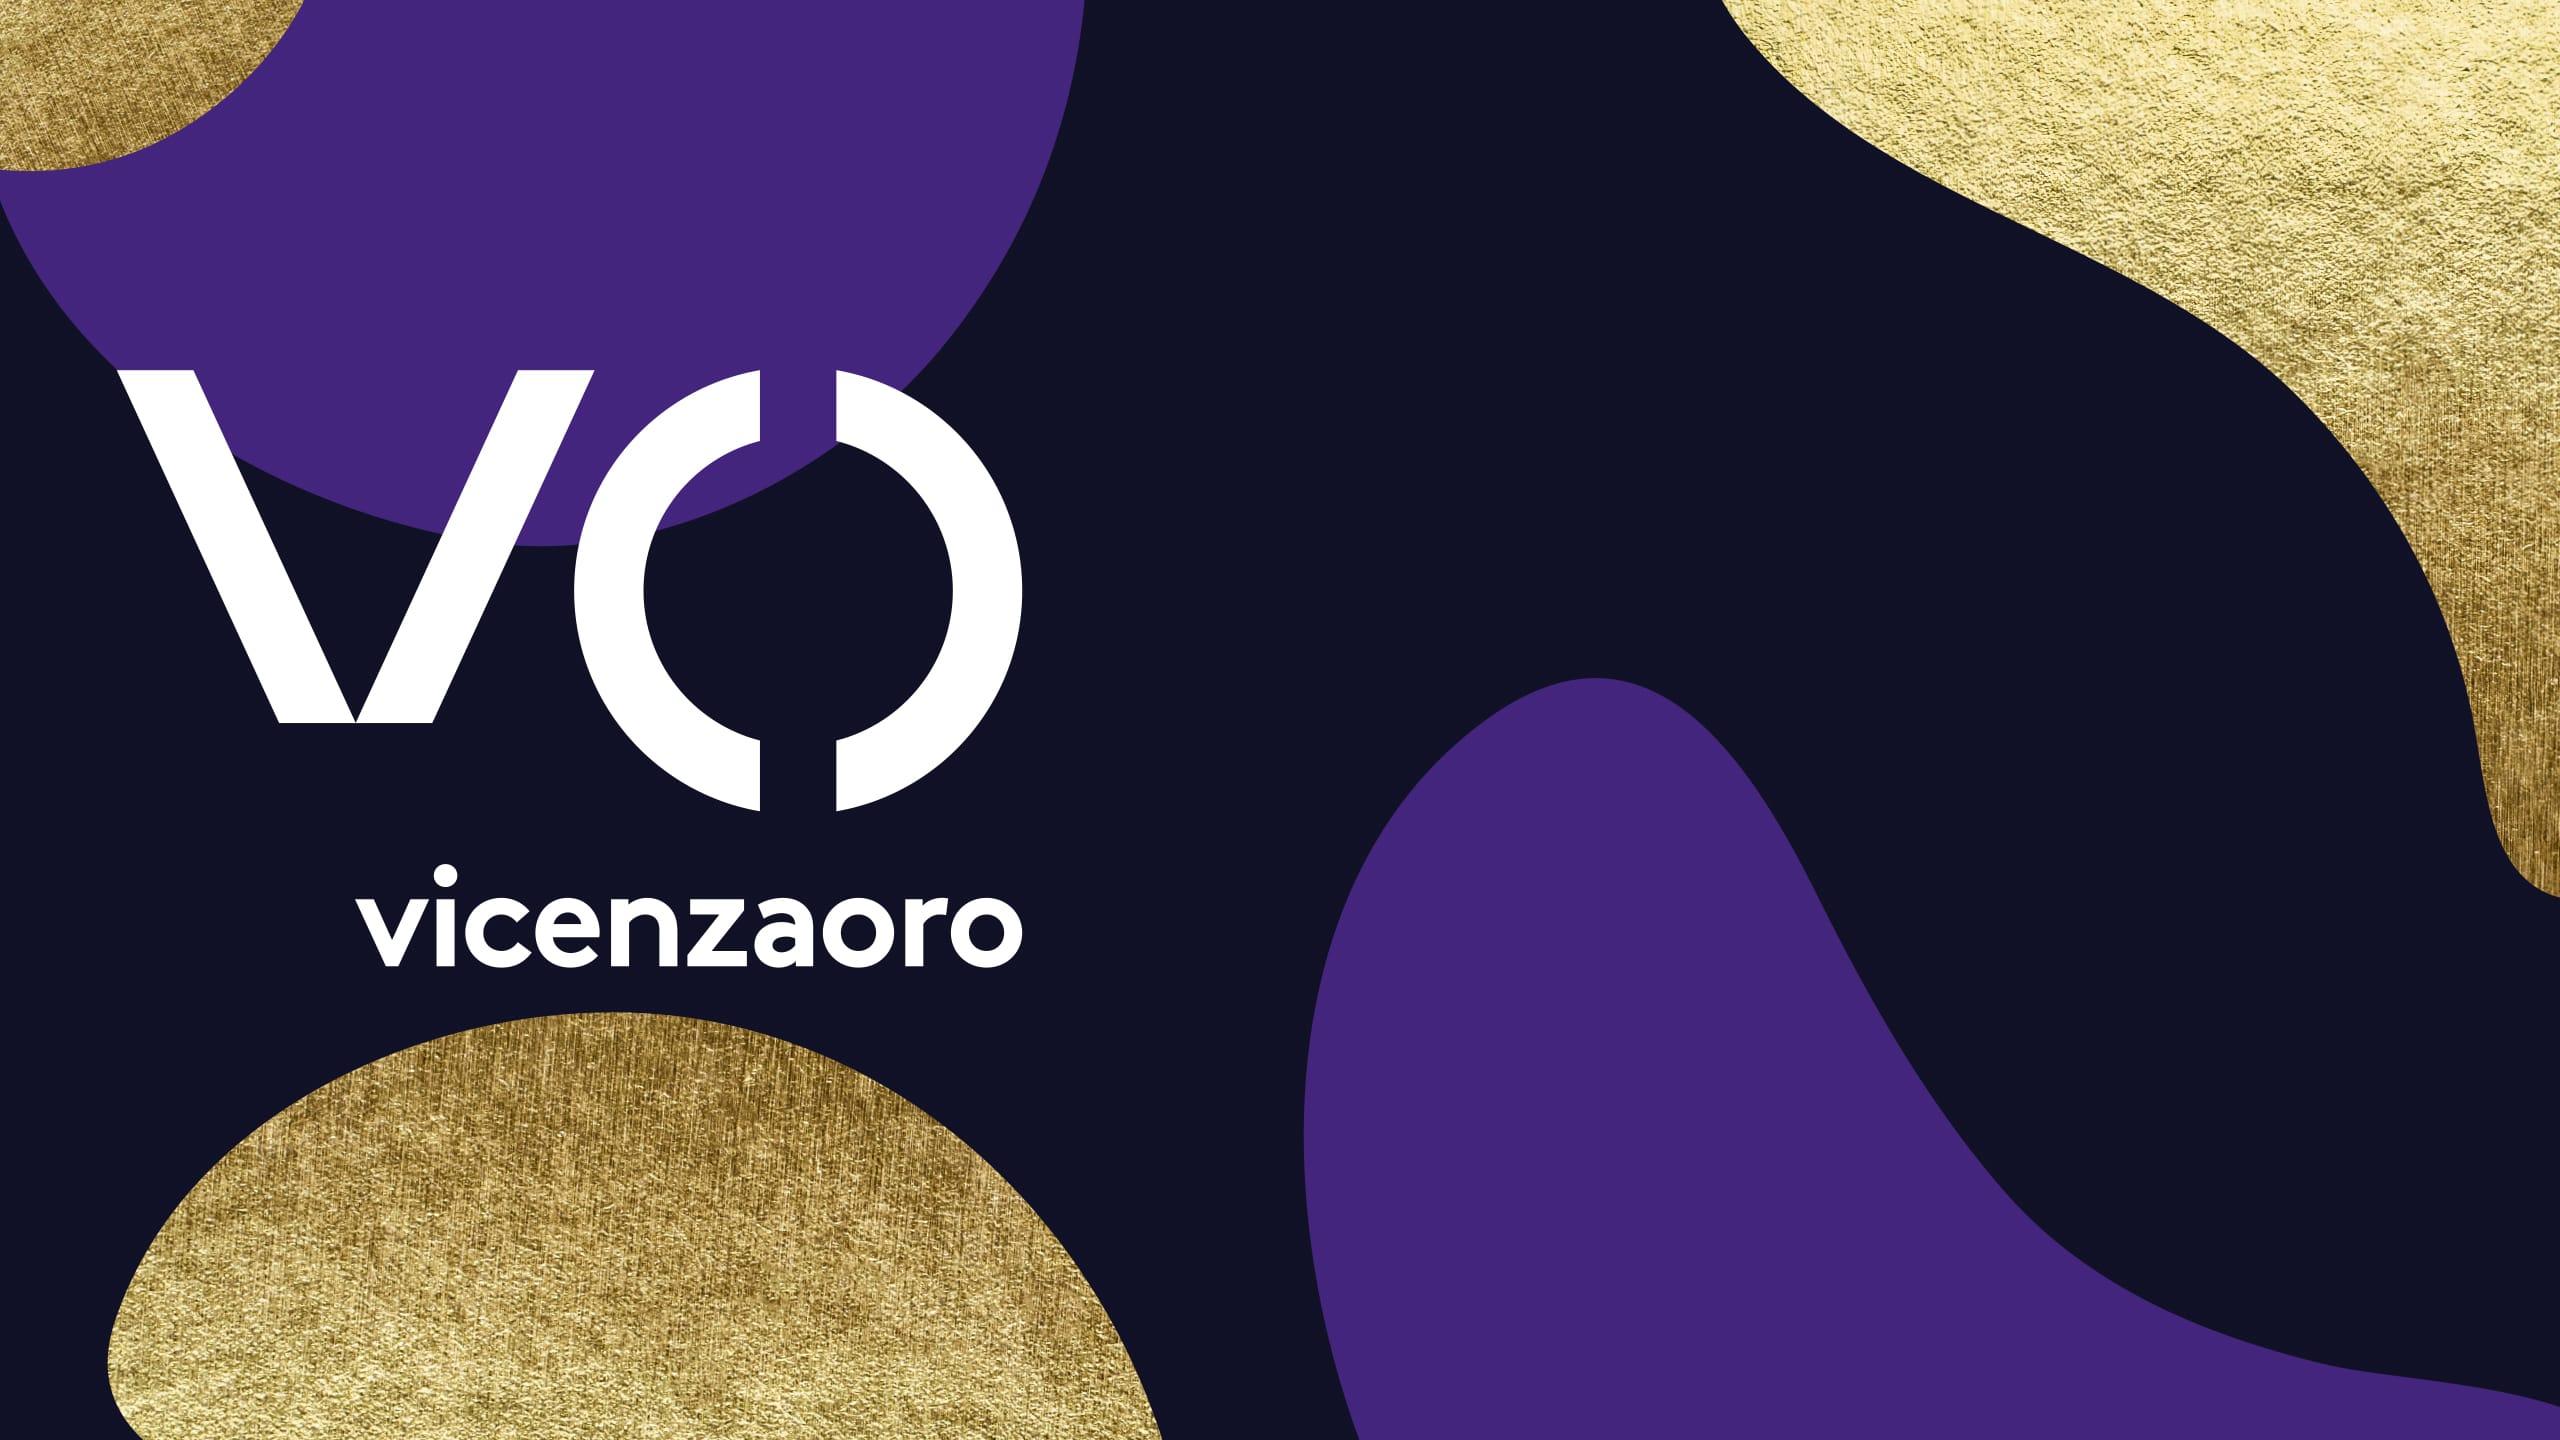 Vicenzaoro Sept 2020